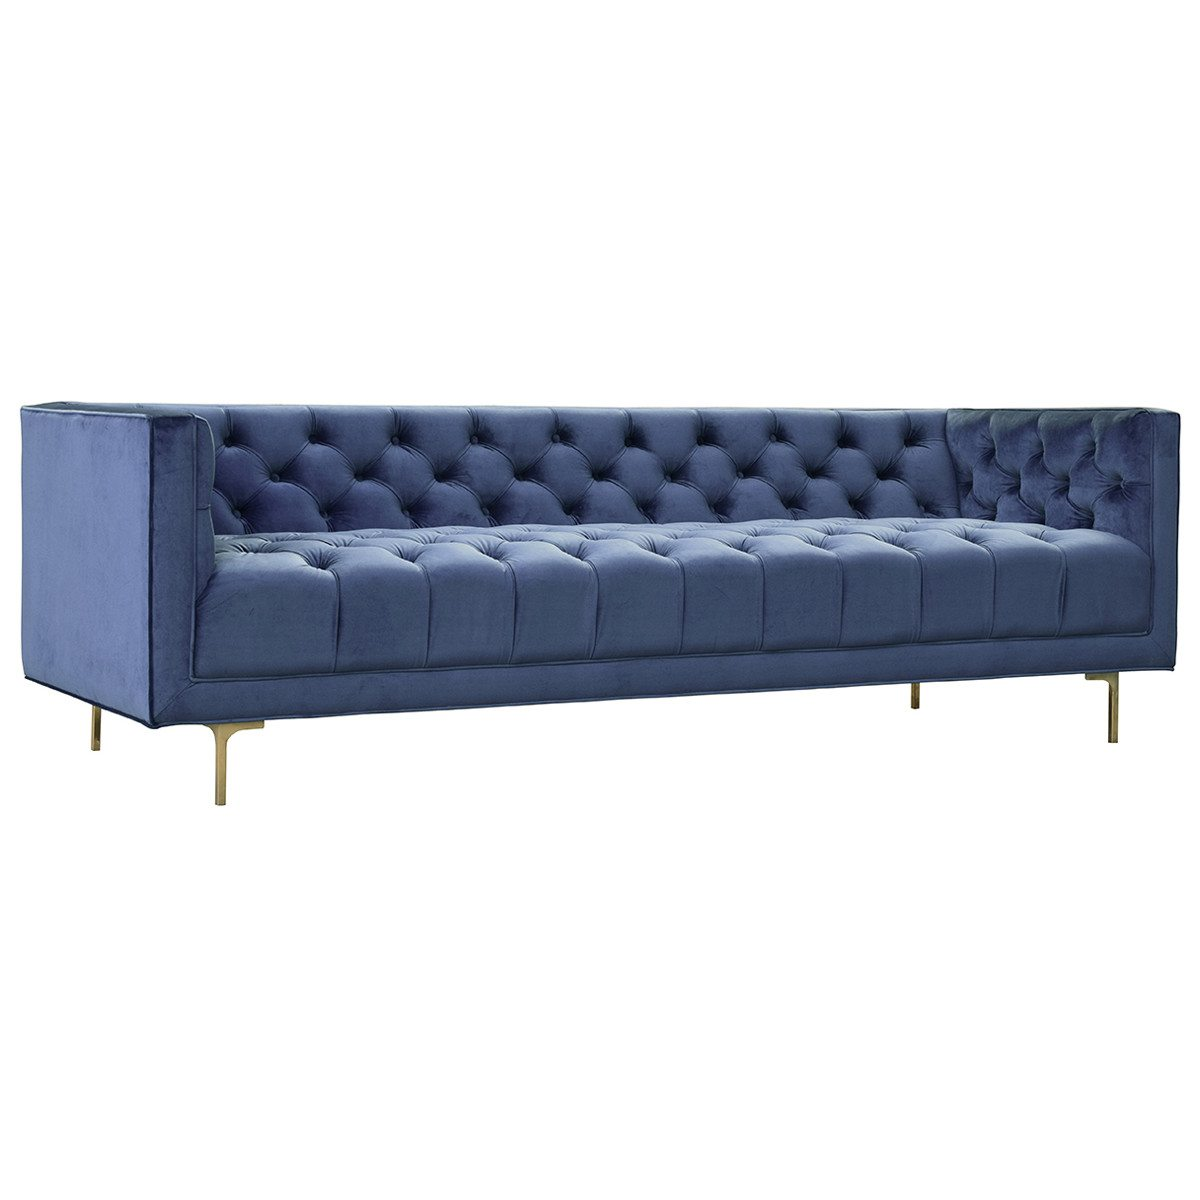 walters-sofa-shopceladon